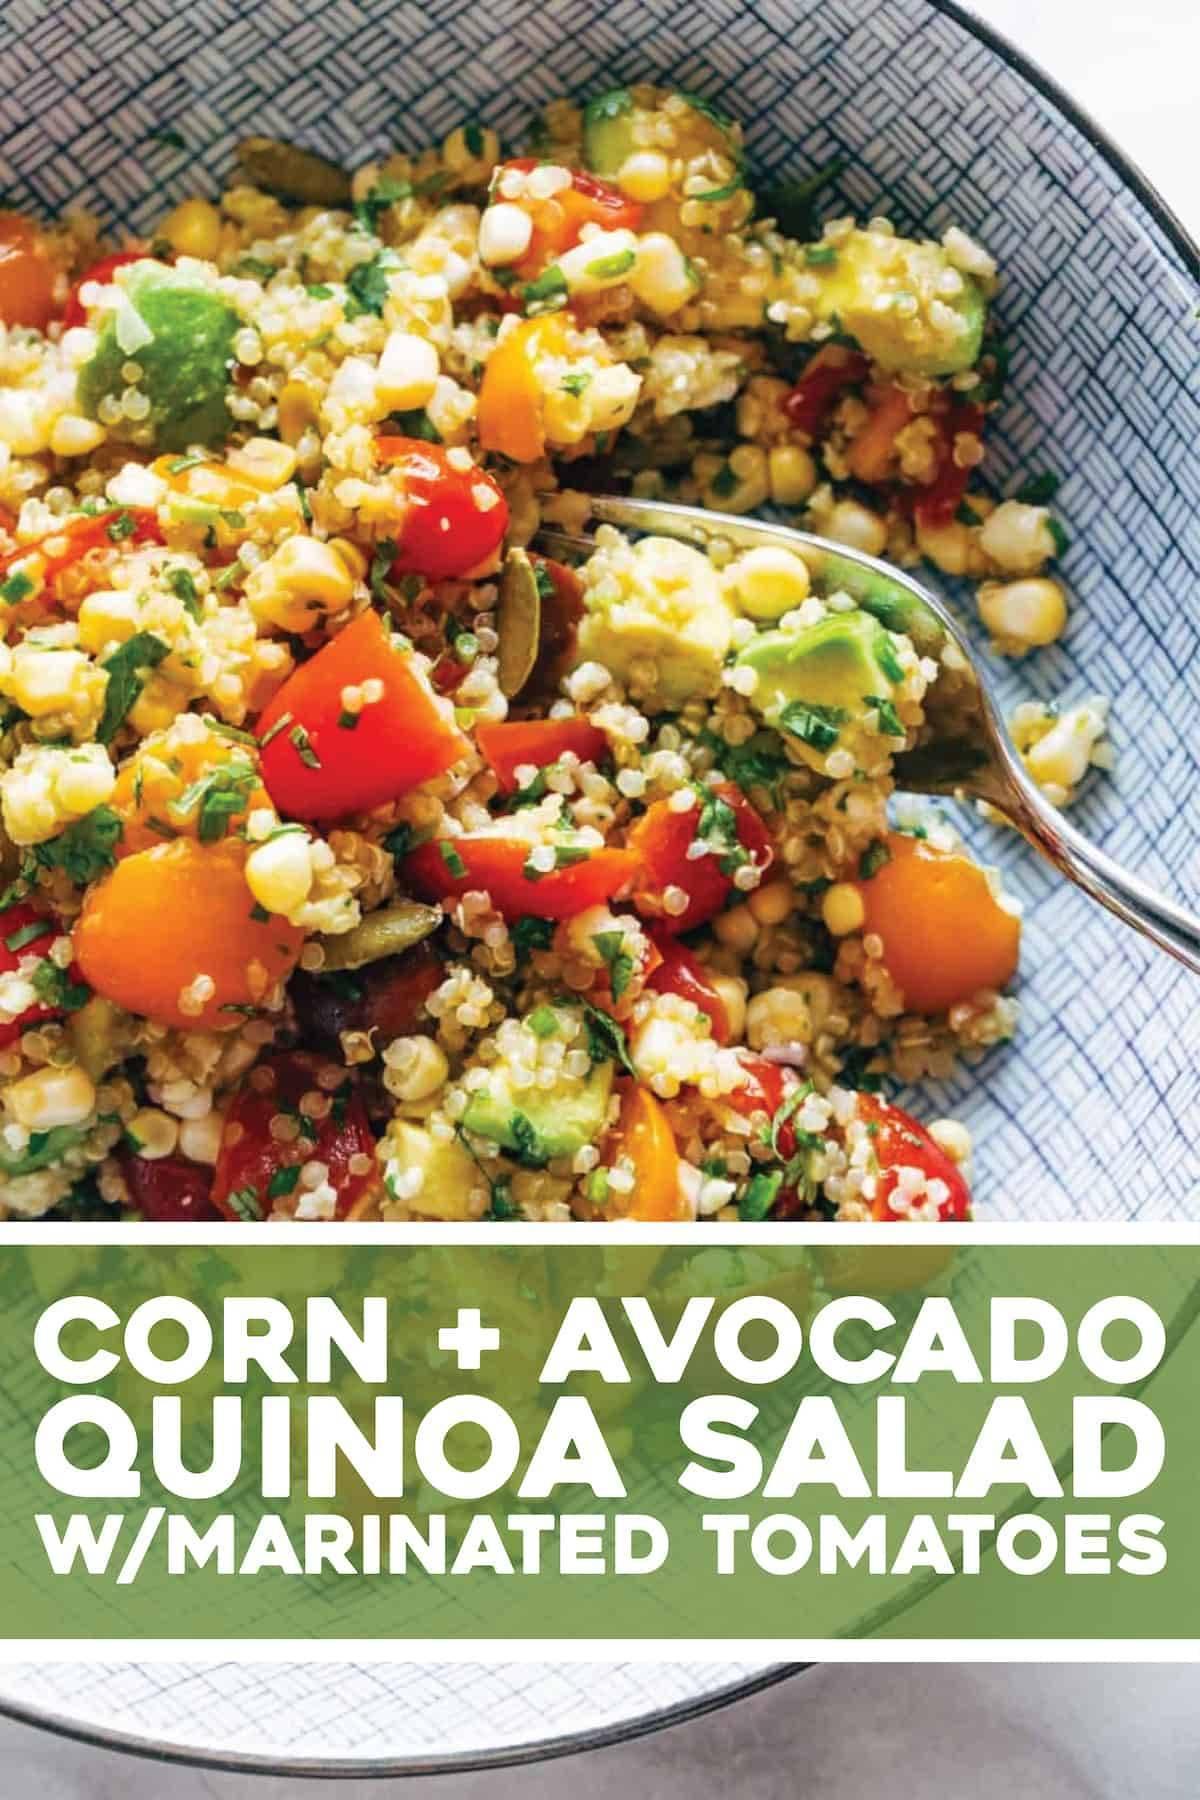 Corn Avocado Quinoa Salad